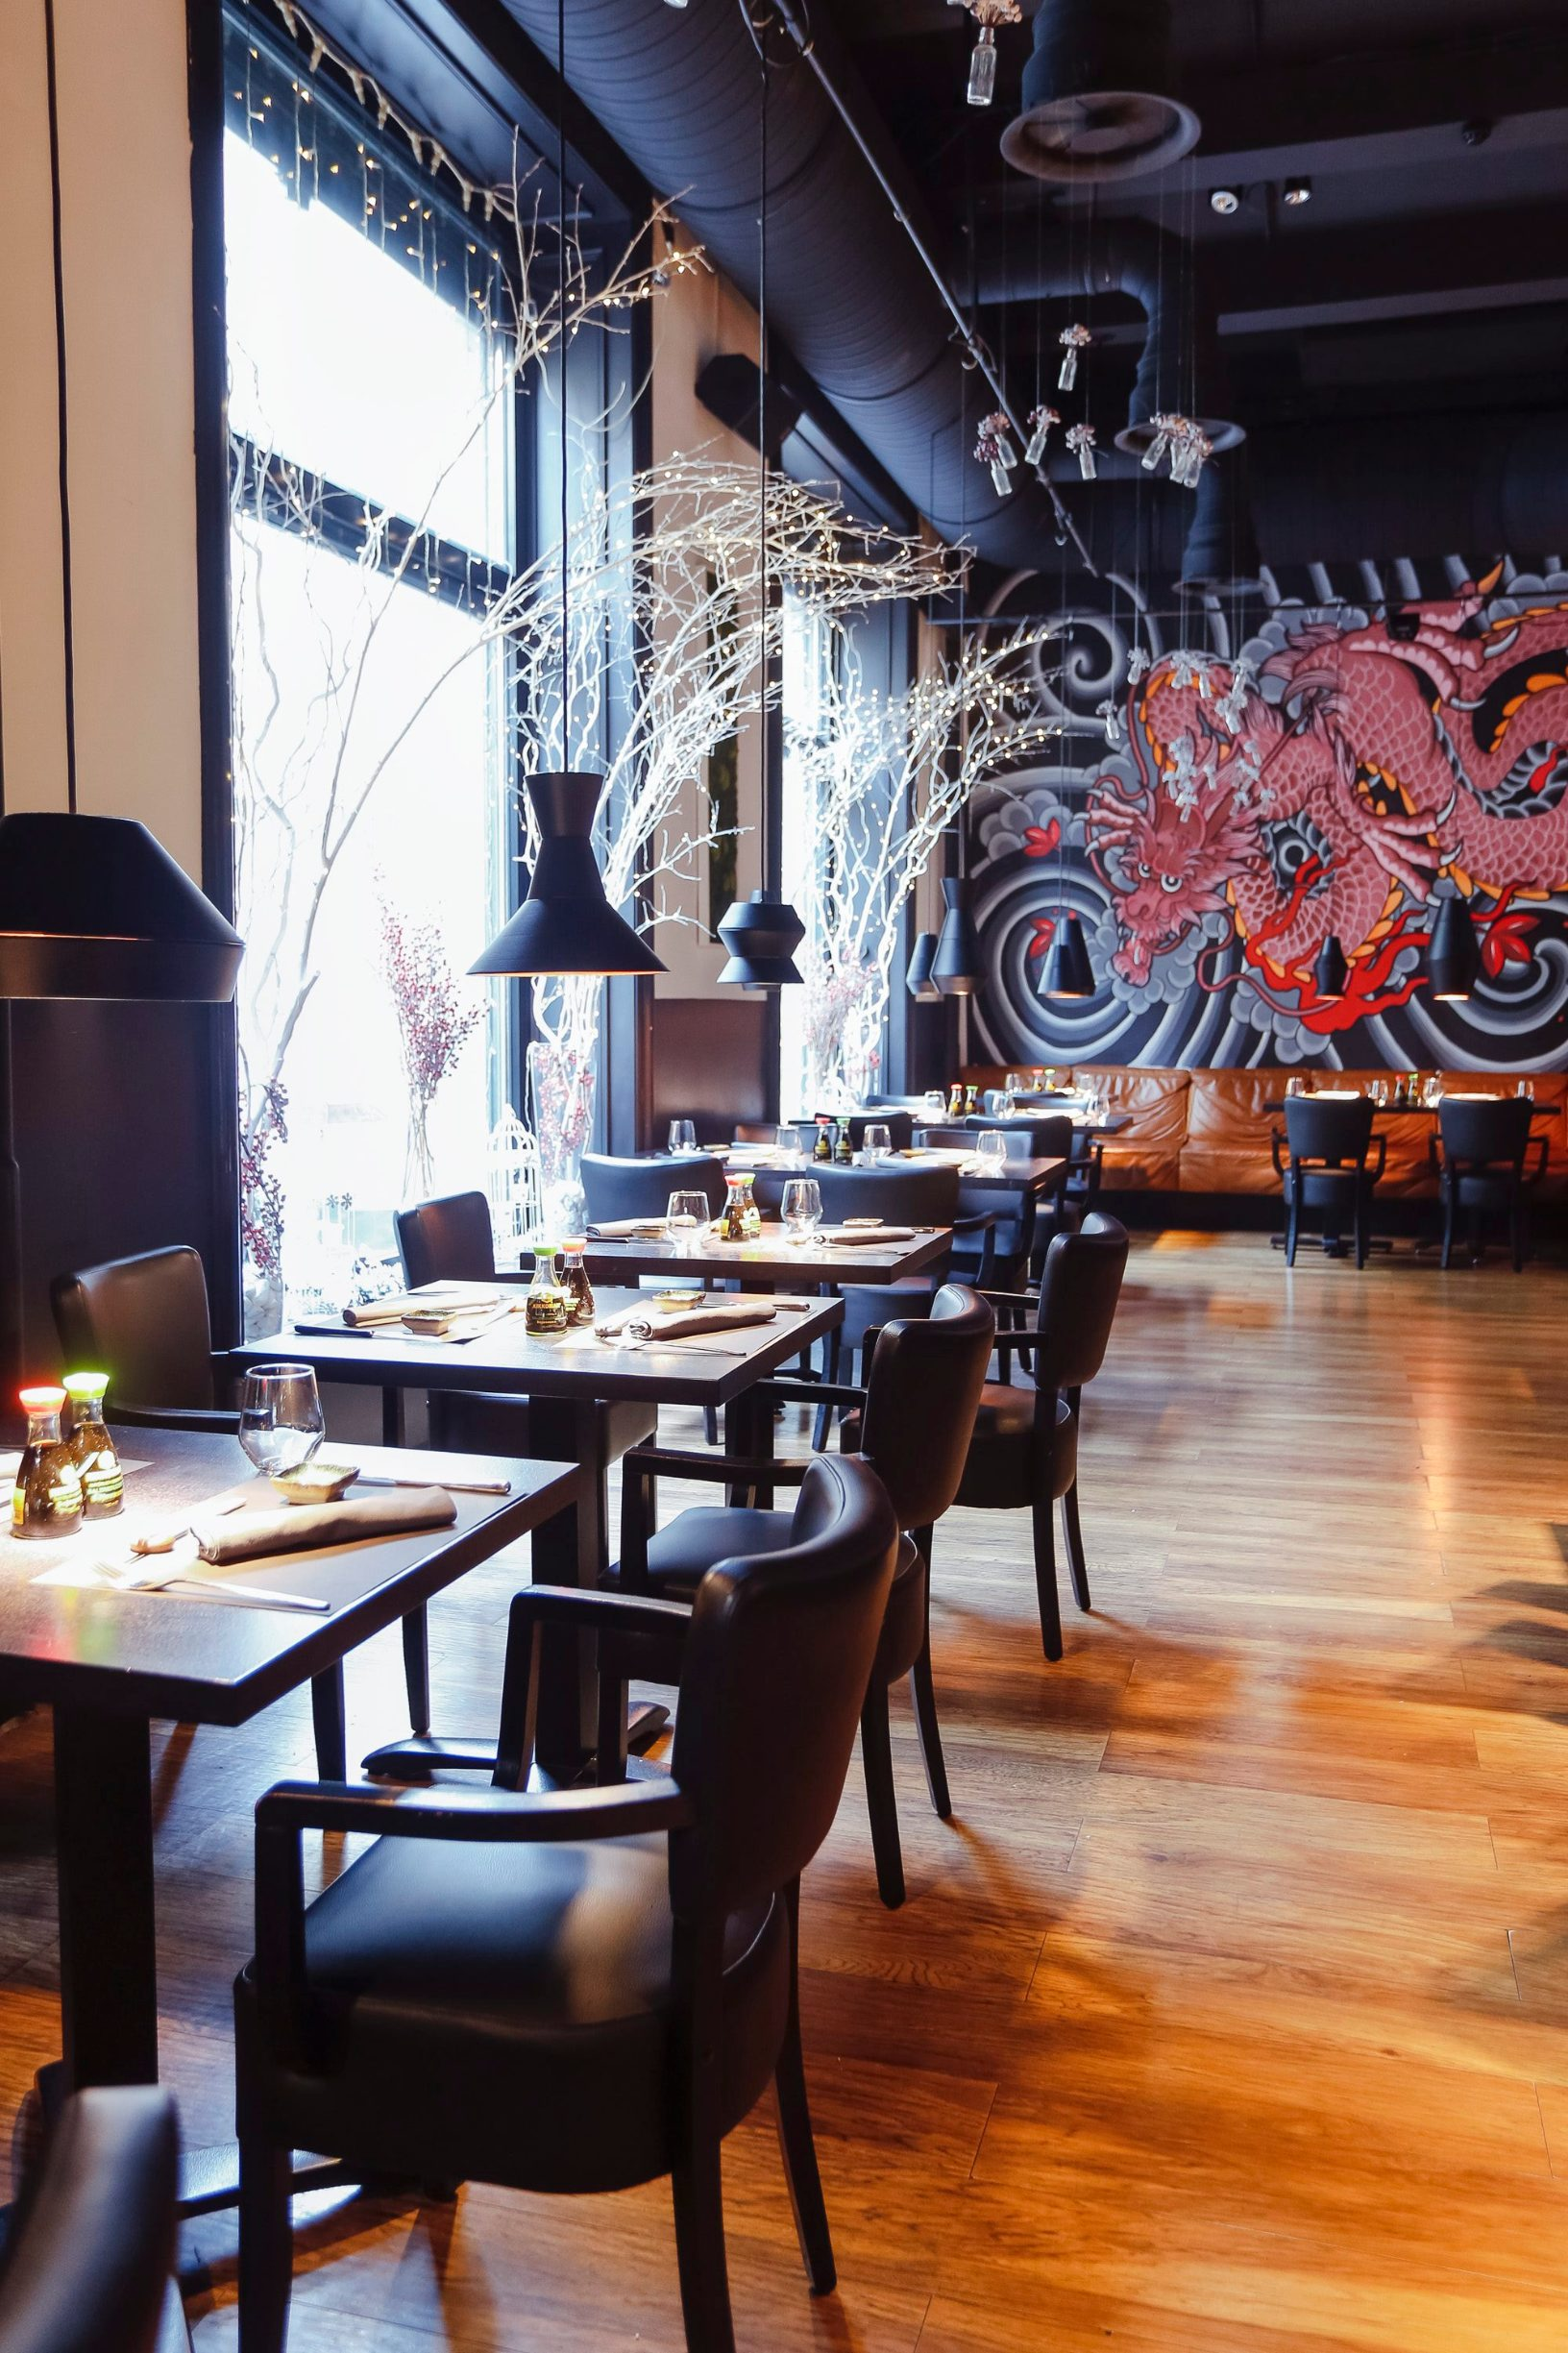 Zagreb, 250119. Petrinjska ulica. Interijer restorana Time Restaurant and Bar. Foto: Marko Todorov / CROPIX